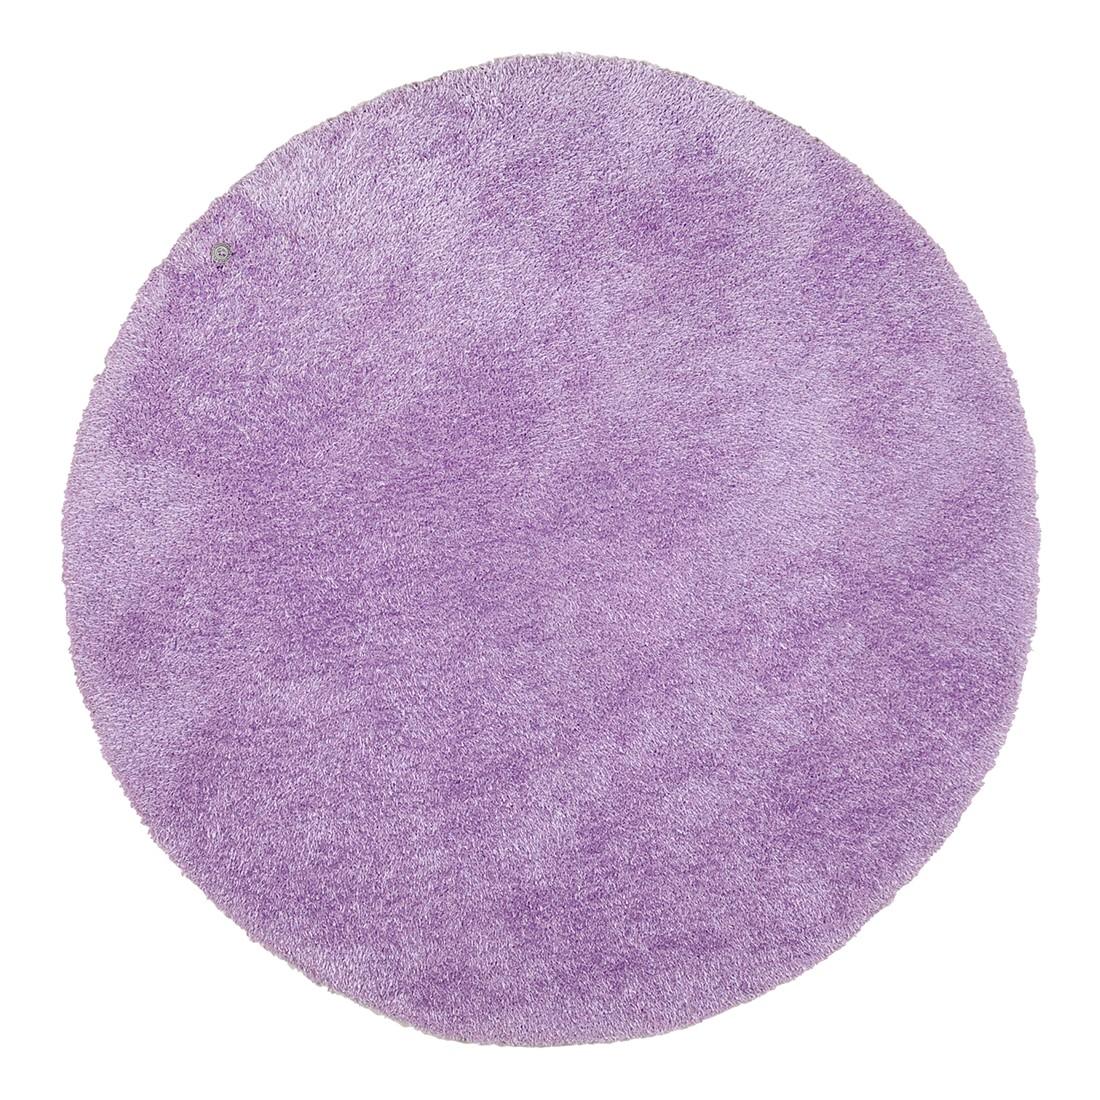 Image of Tappeto soft round - viola chiaro - dimensioni: 140 x 140 cm, Tom Tailor